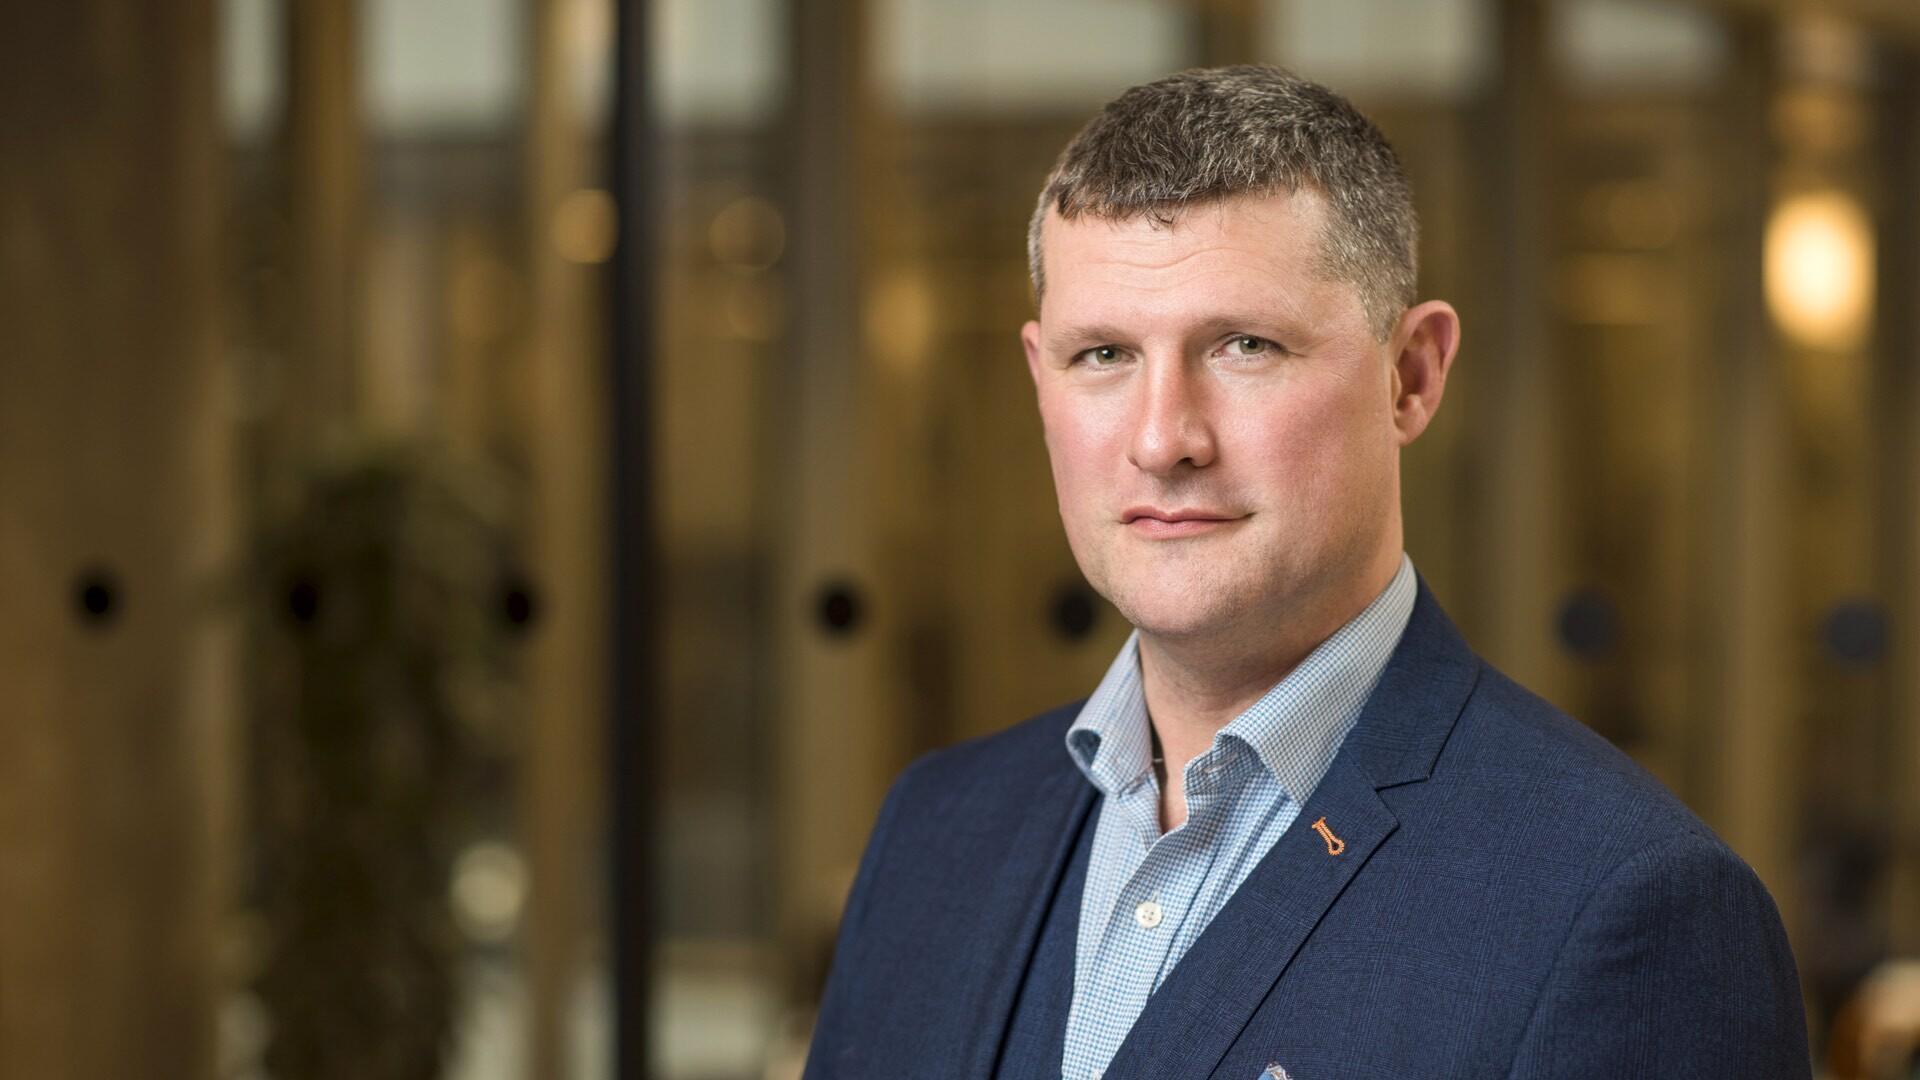 James Dening, Minit CEO